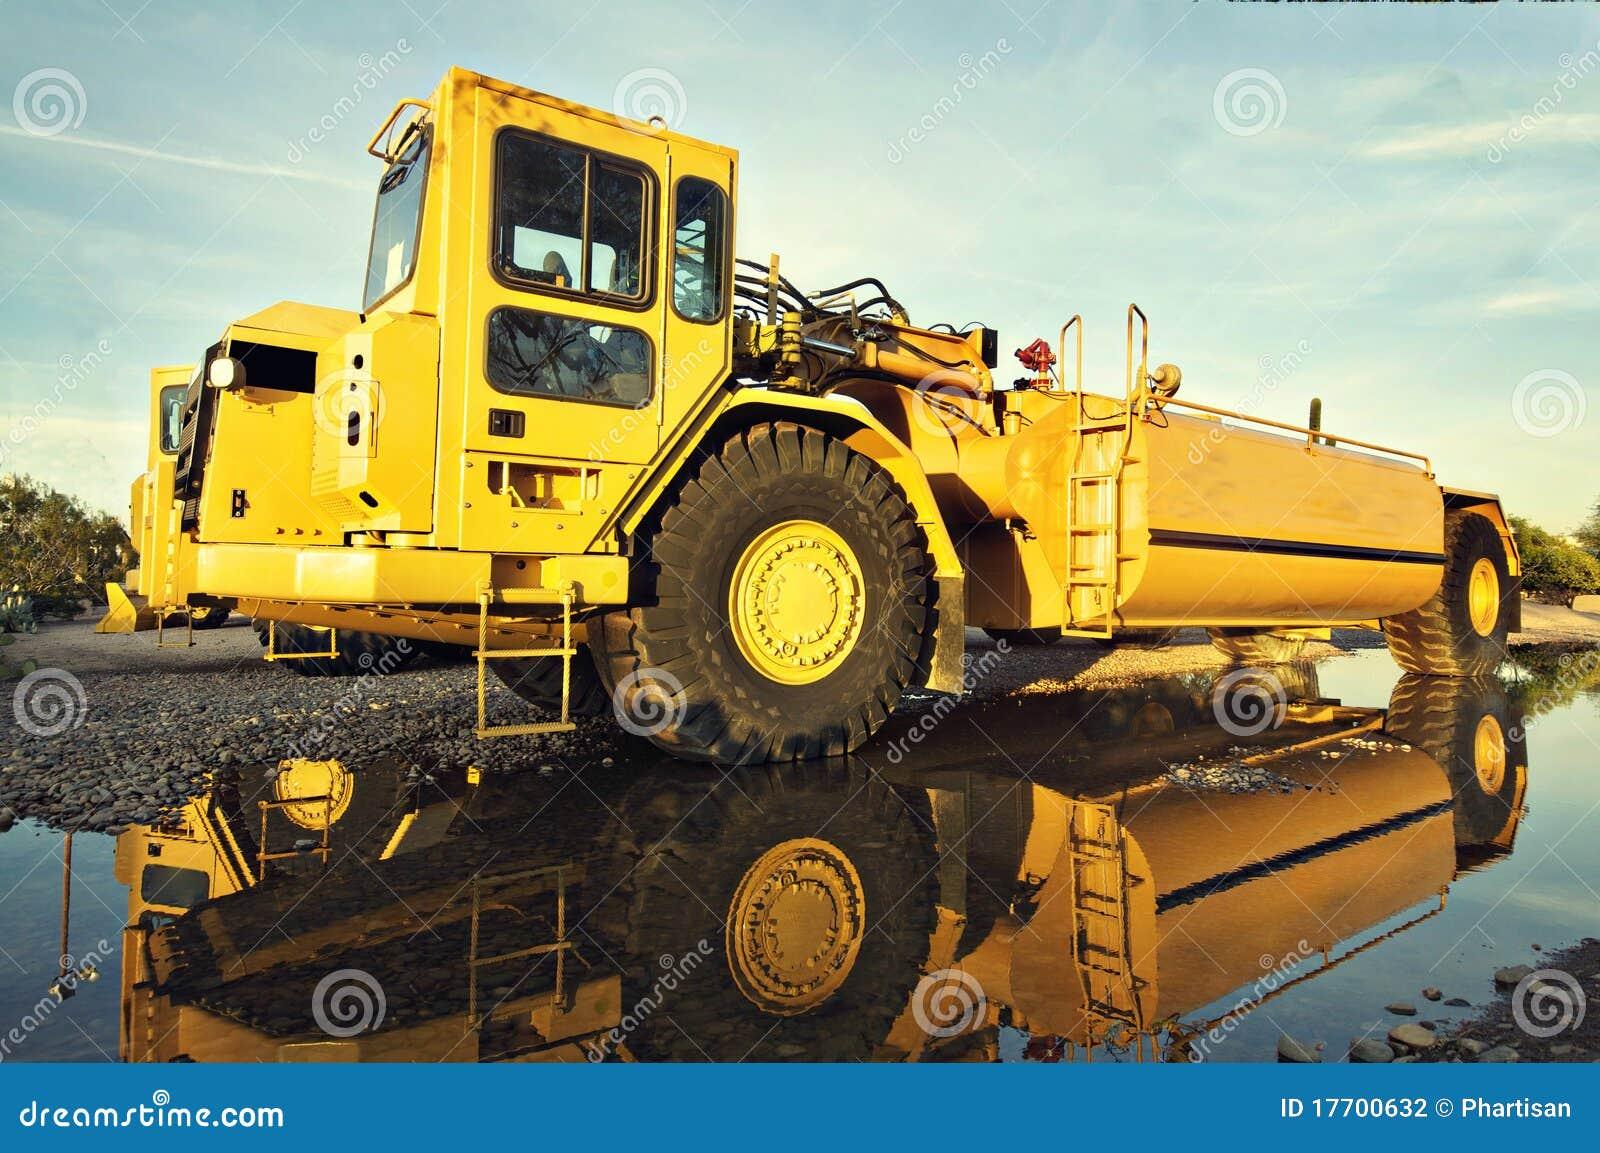 Construction heavy duty vehicle equipment